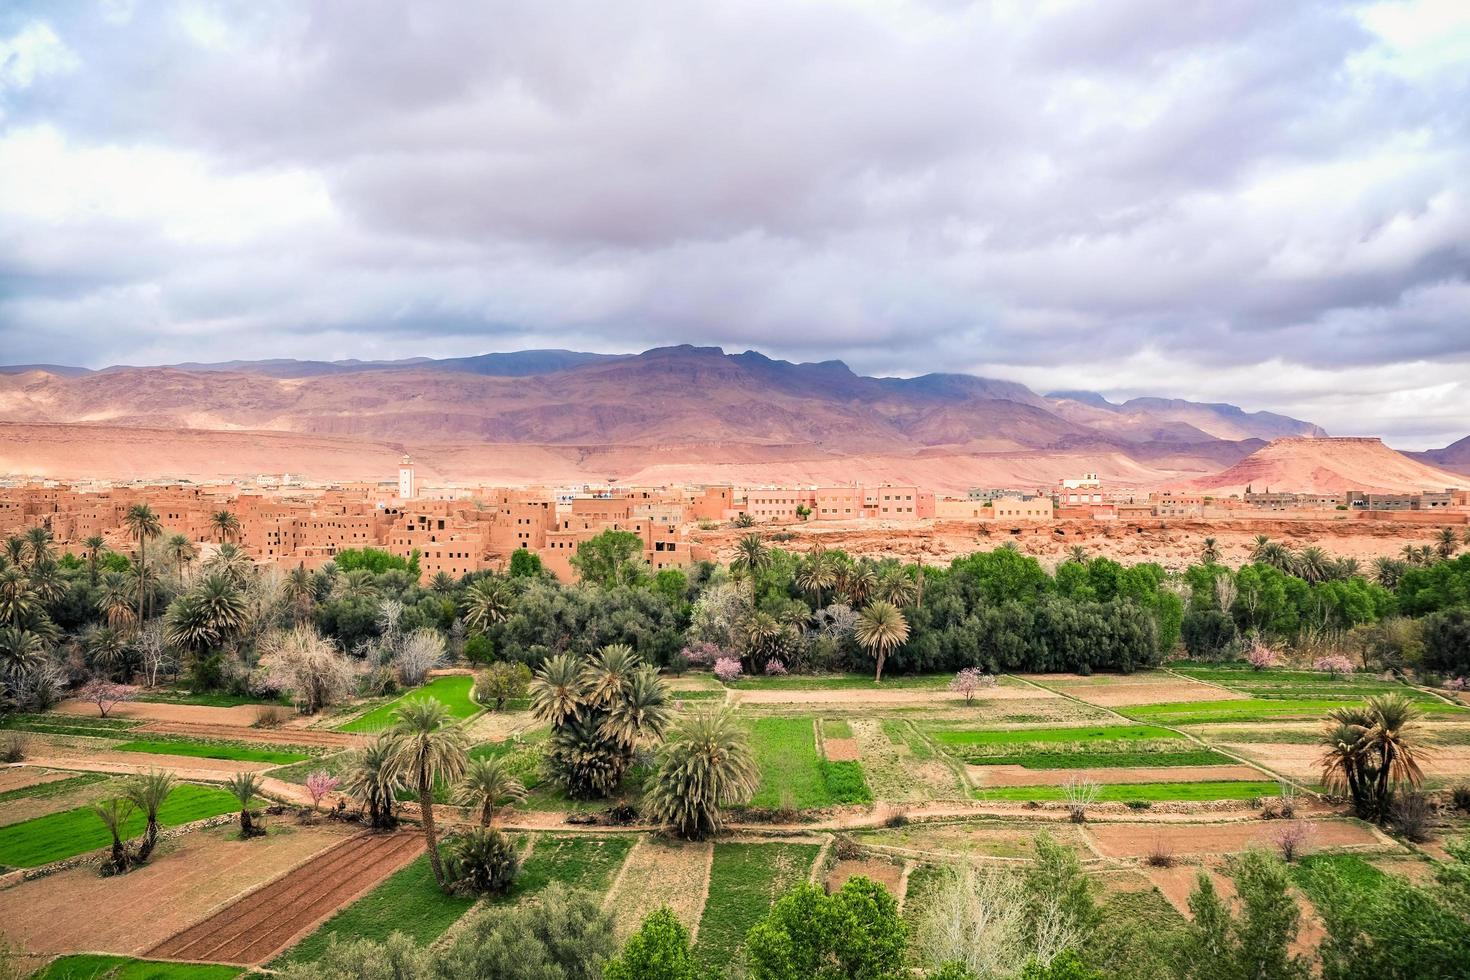 Landscape view of Tinghir City photo